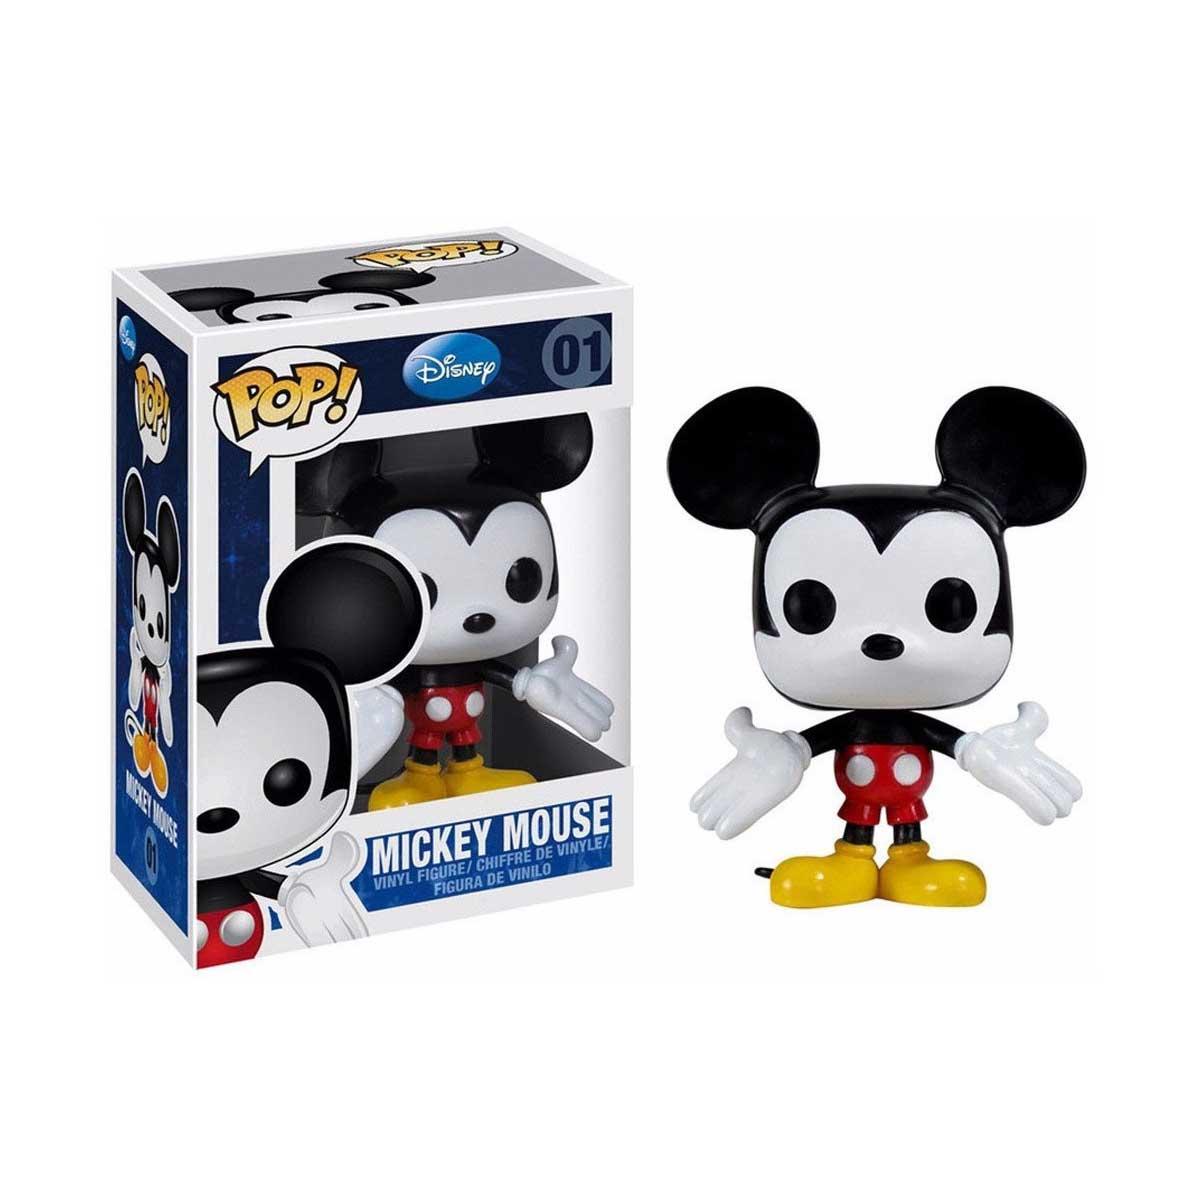 Funko Pop Mickey Mouse 01 Disney